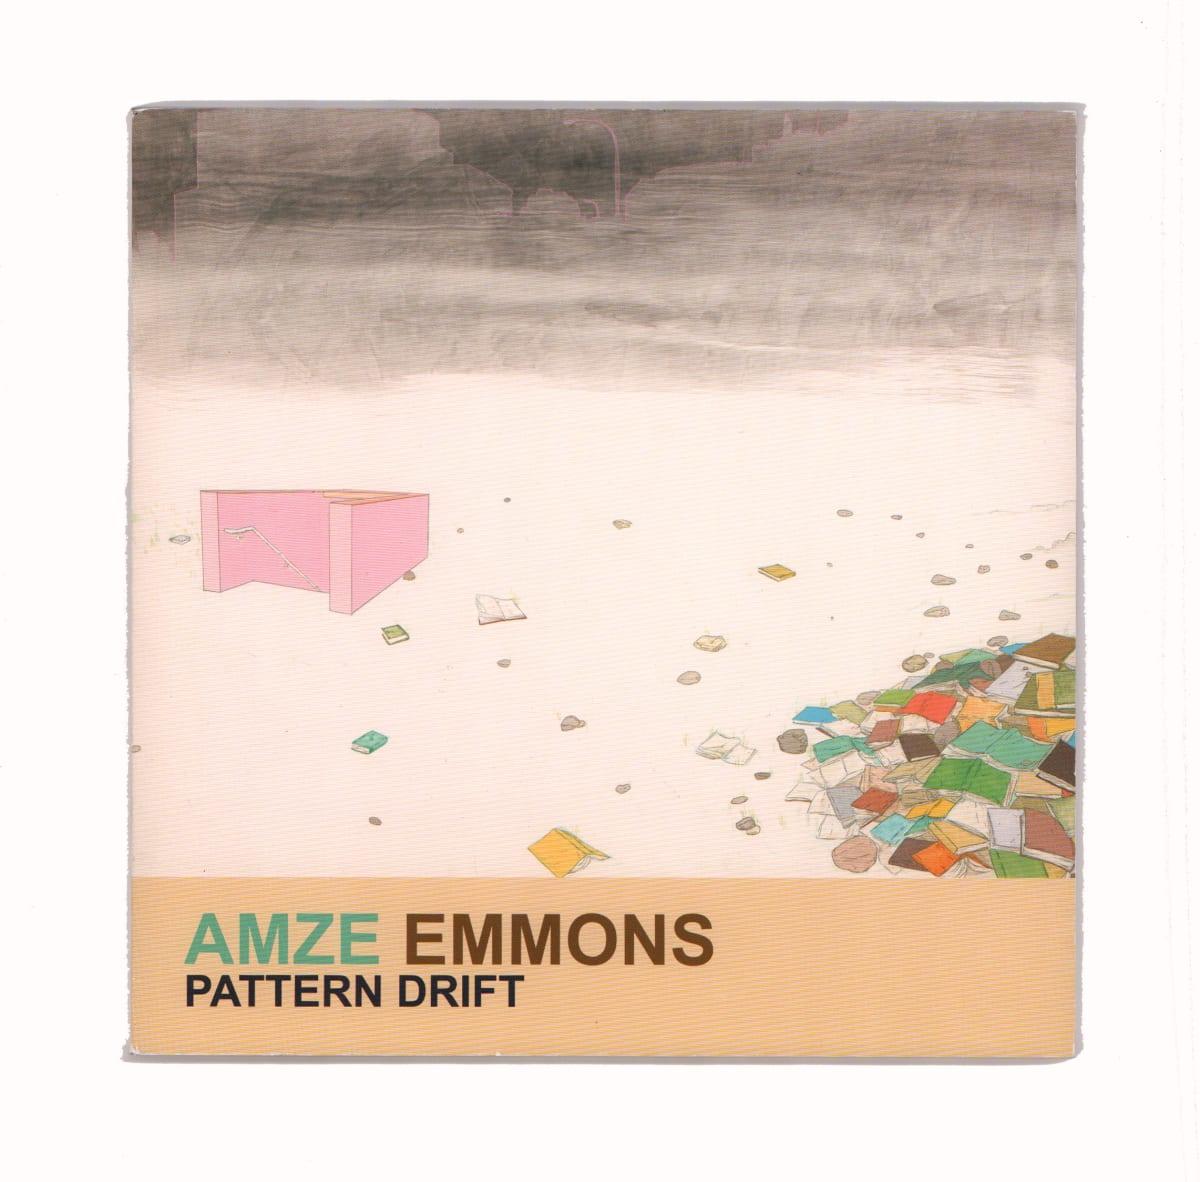 Amze Emmons